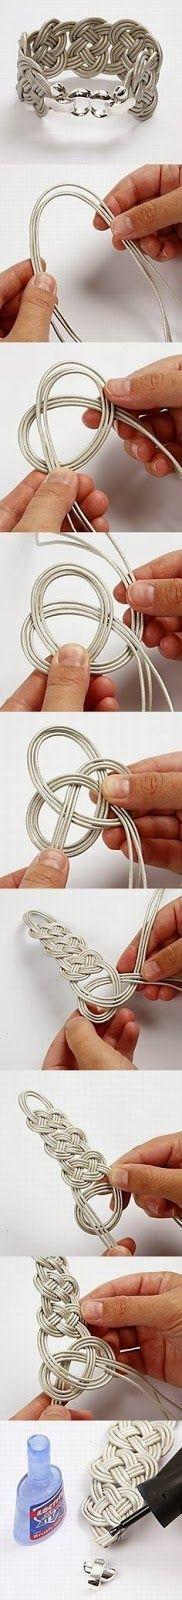 303Pixels: DIY Leather Bracelet